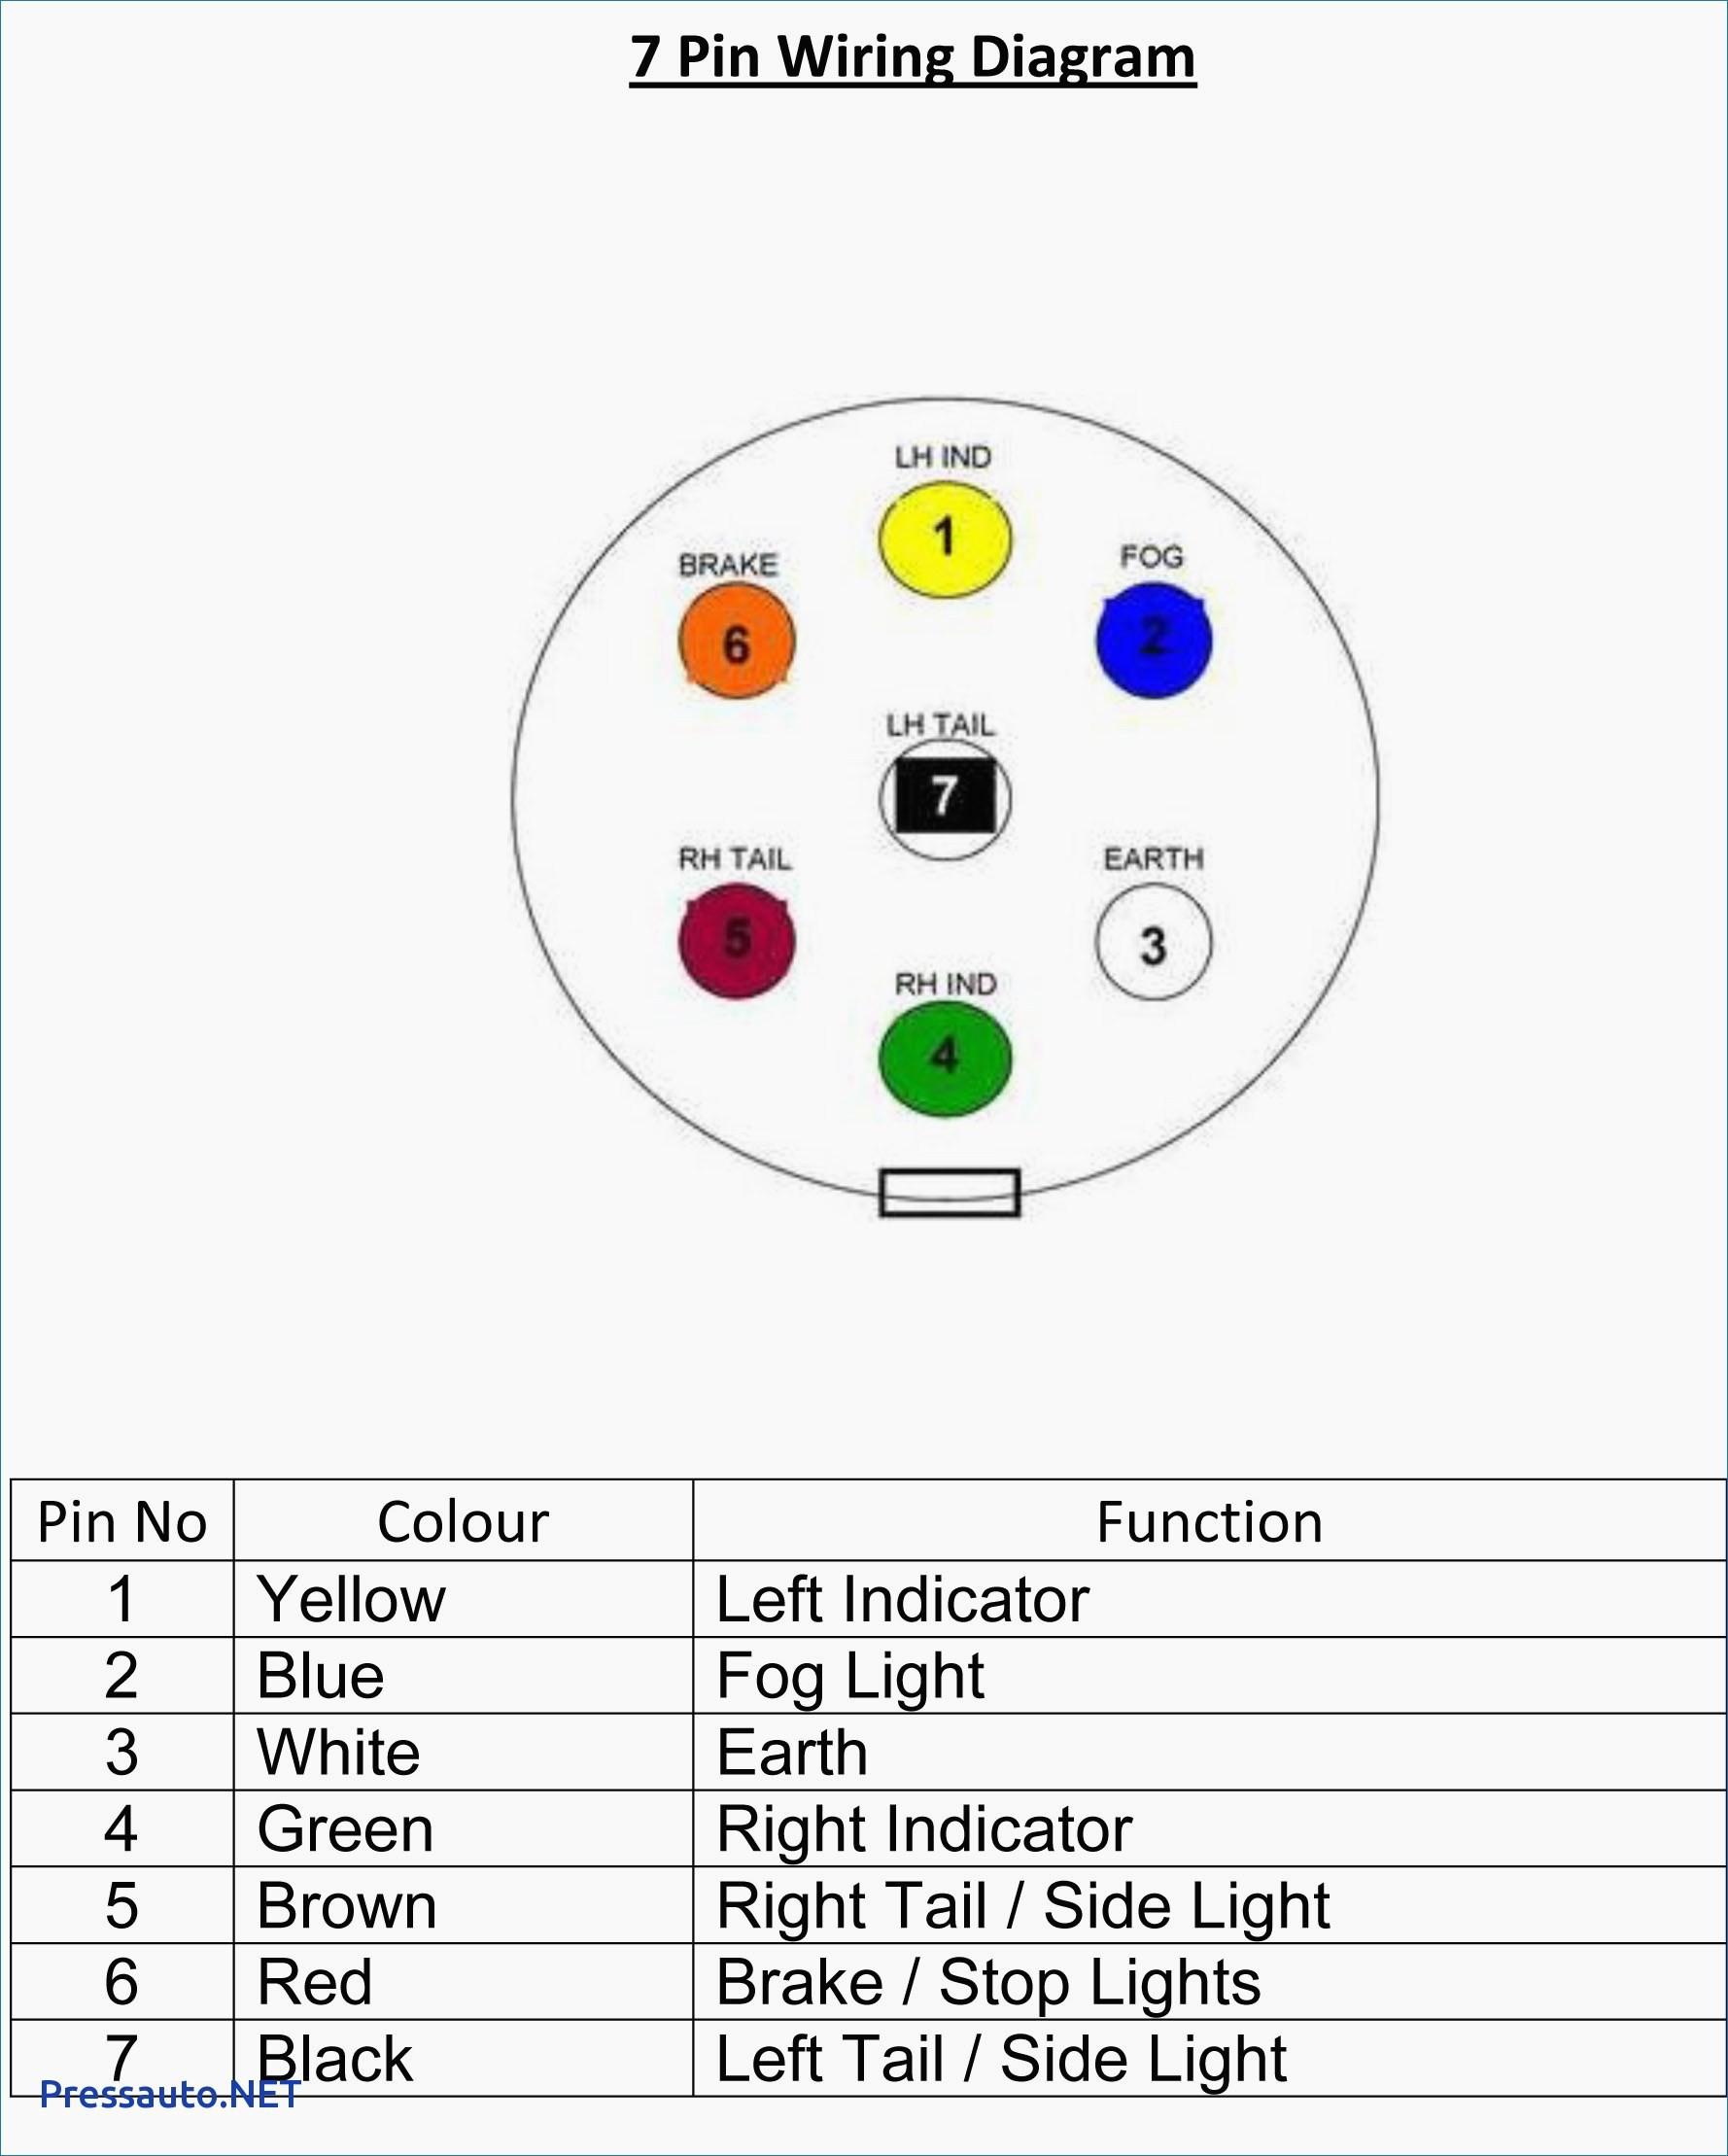 Pollak 12 705 Wiring Diagram   Best Wiring Library - 7 Way Trailer Plug Wiring Diagram Ford